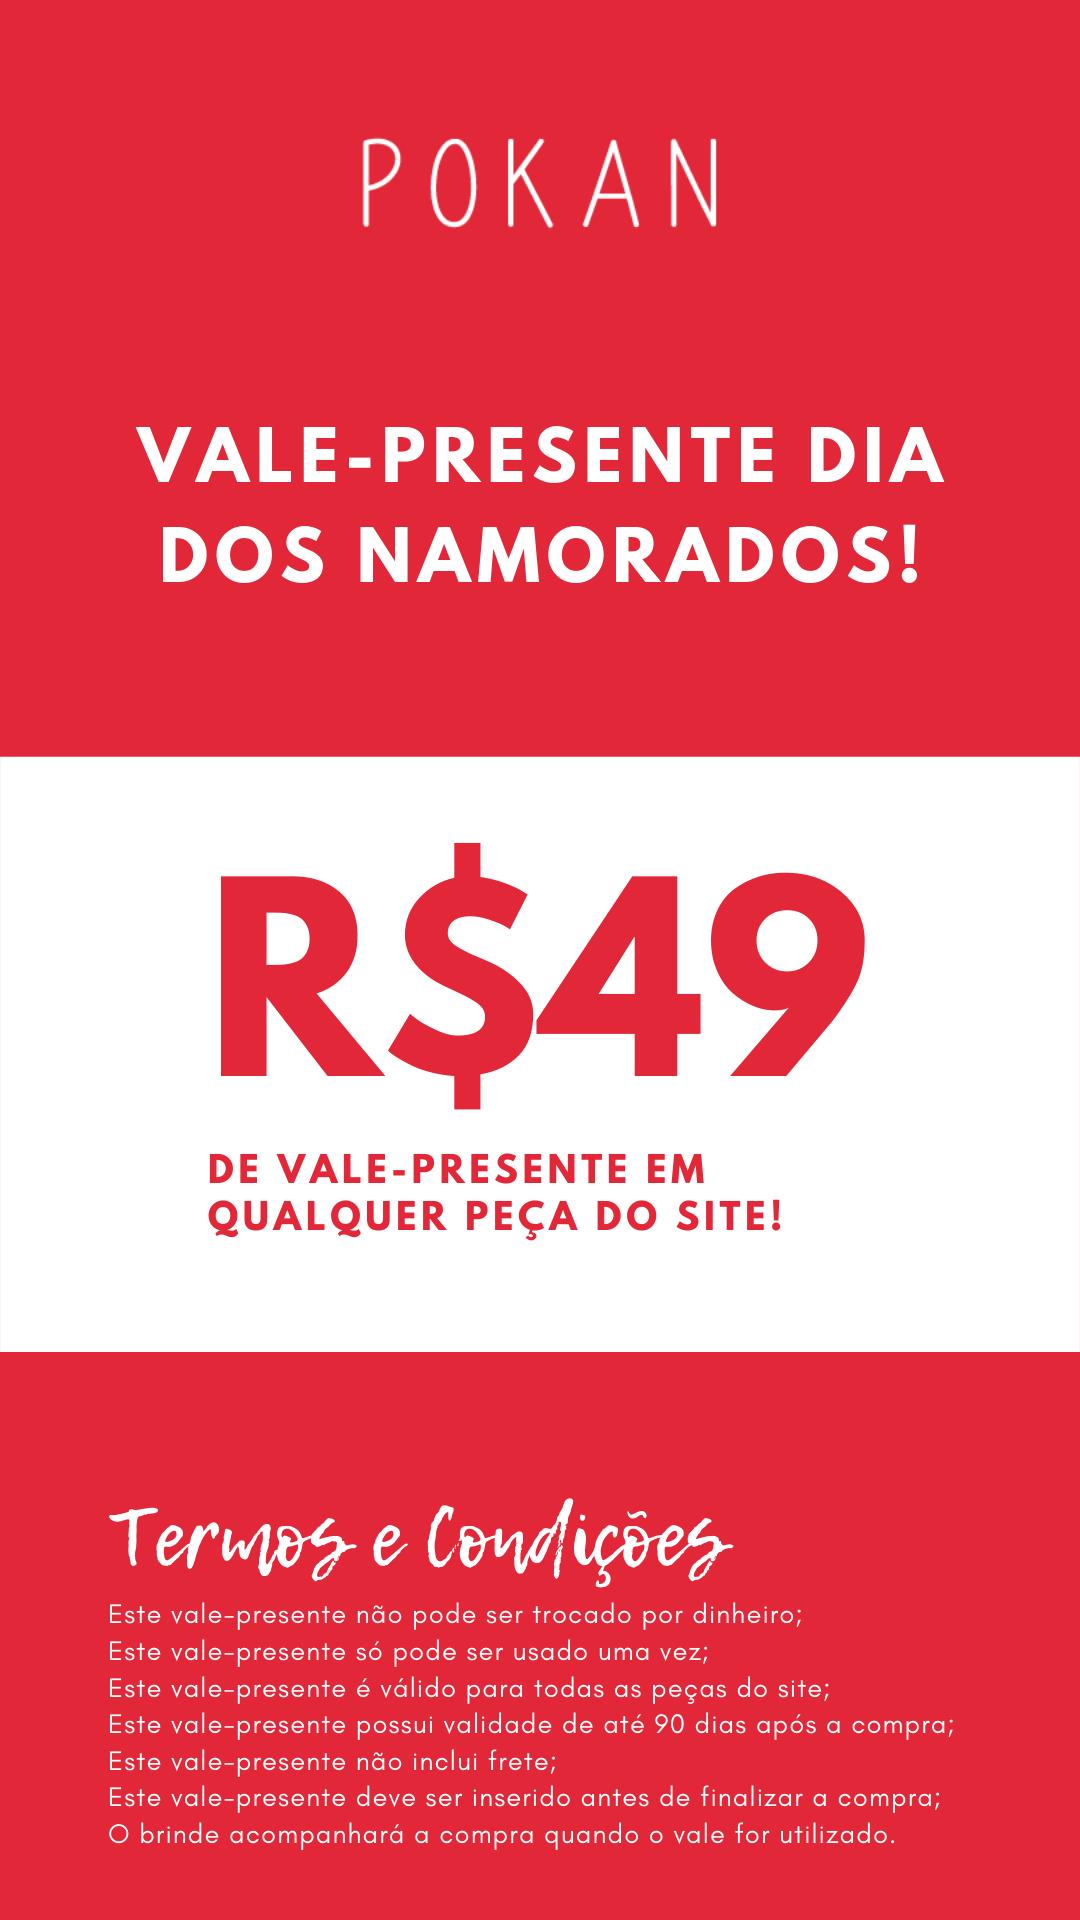 Vale Presente - R$49,00